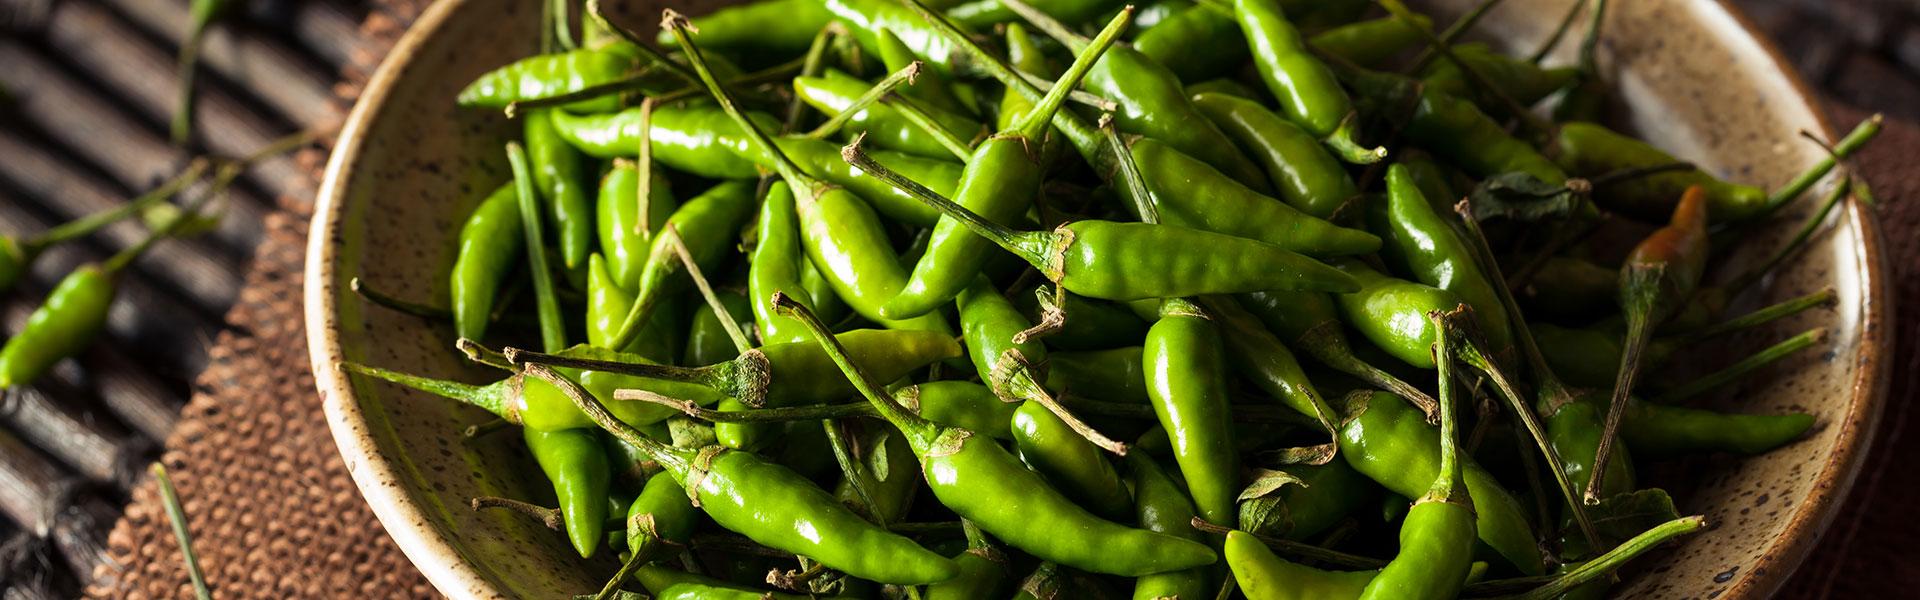 hot-green-thai-chili-pepper-PTWPX4Y